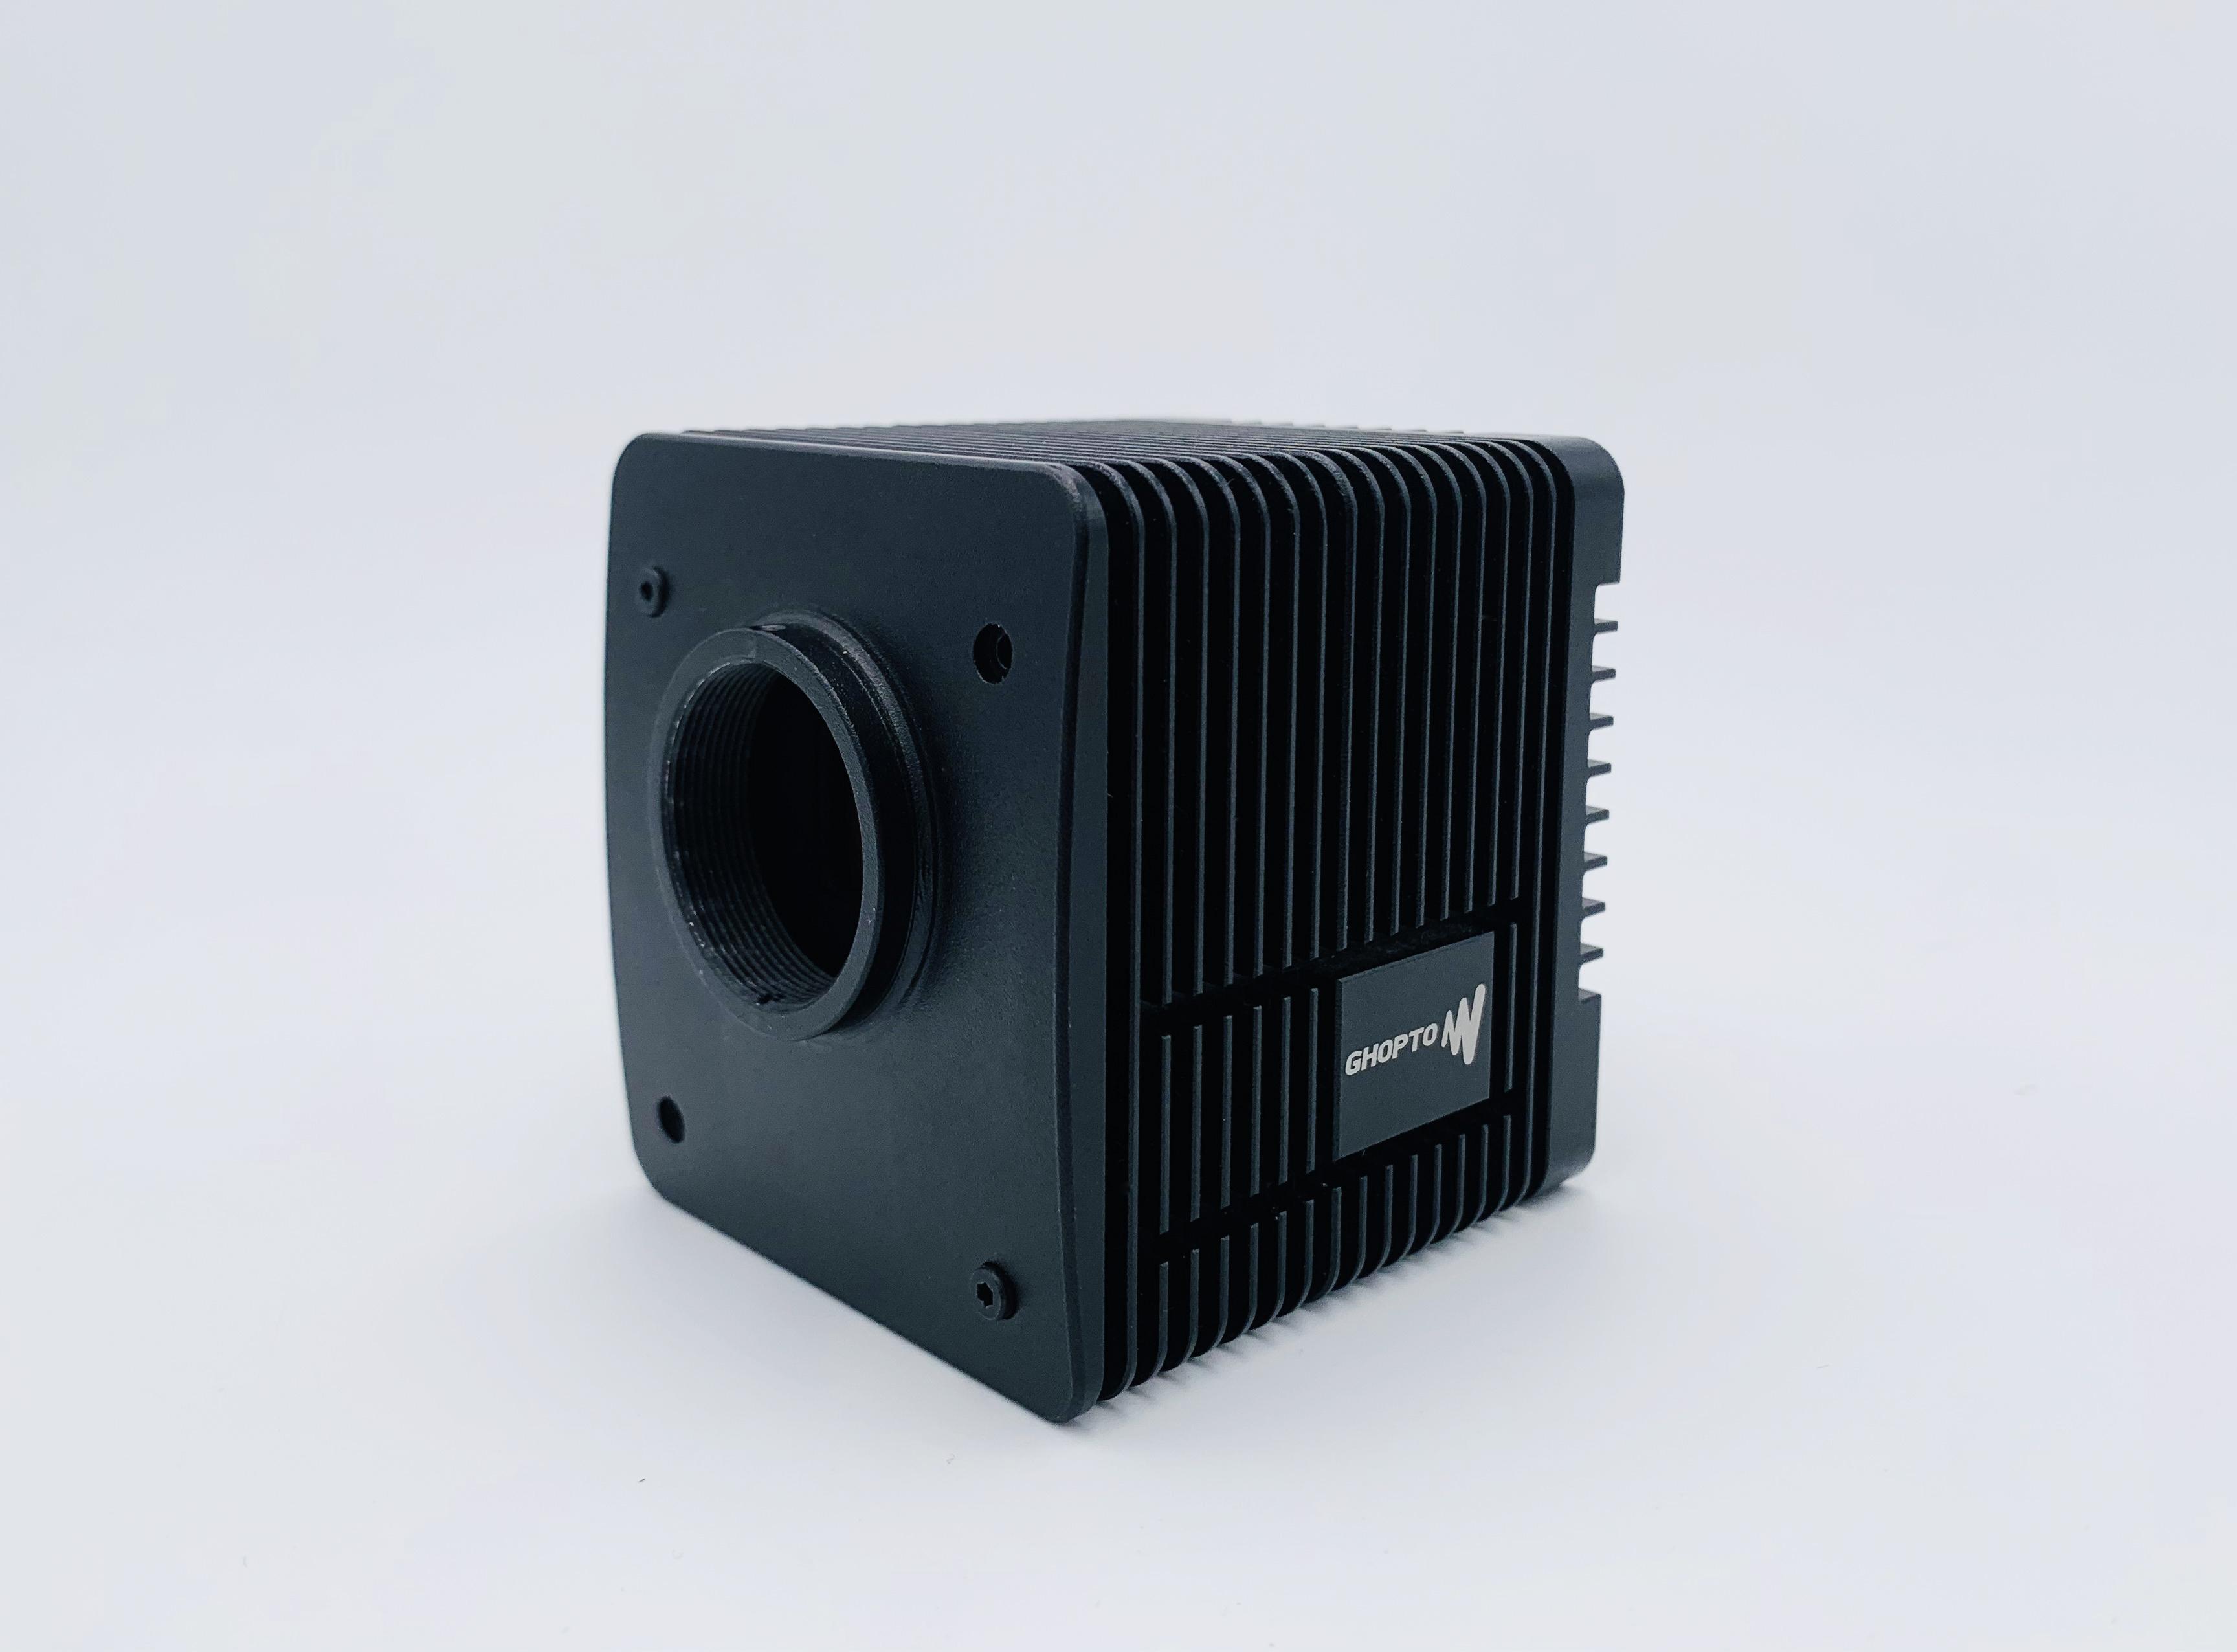 Ingaas Camera Area Scan Gh-sw640-u2 High Sensitivity Industrial Camera -  Buy Shortwave Infrared Camera Swir Camera,Ingaas Camera,640x512 Camera  Product on Alibaba.com